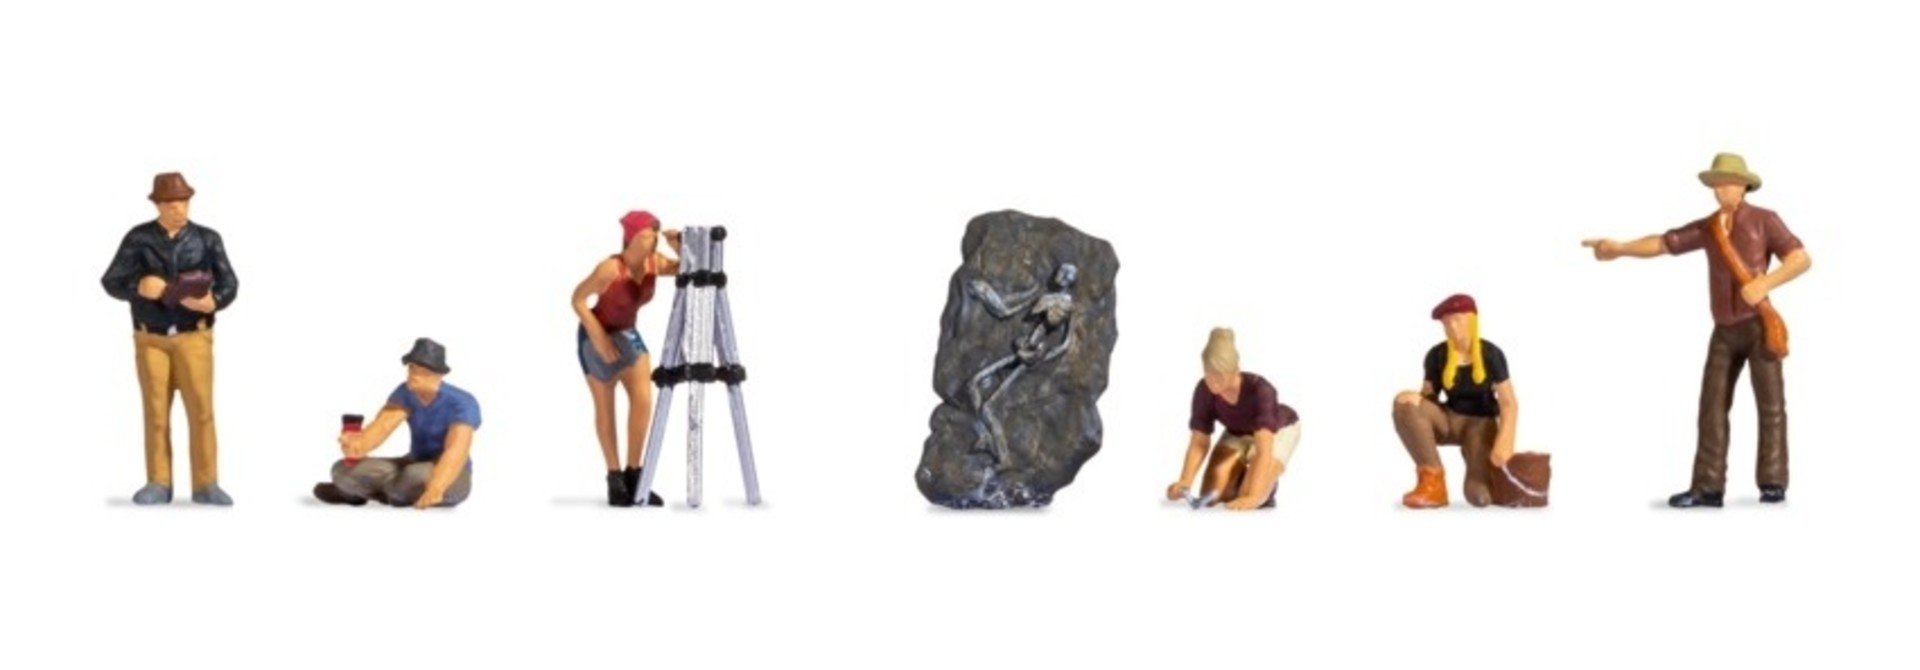 15043 Archäologen